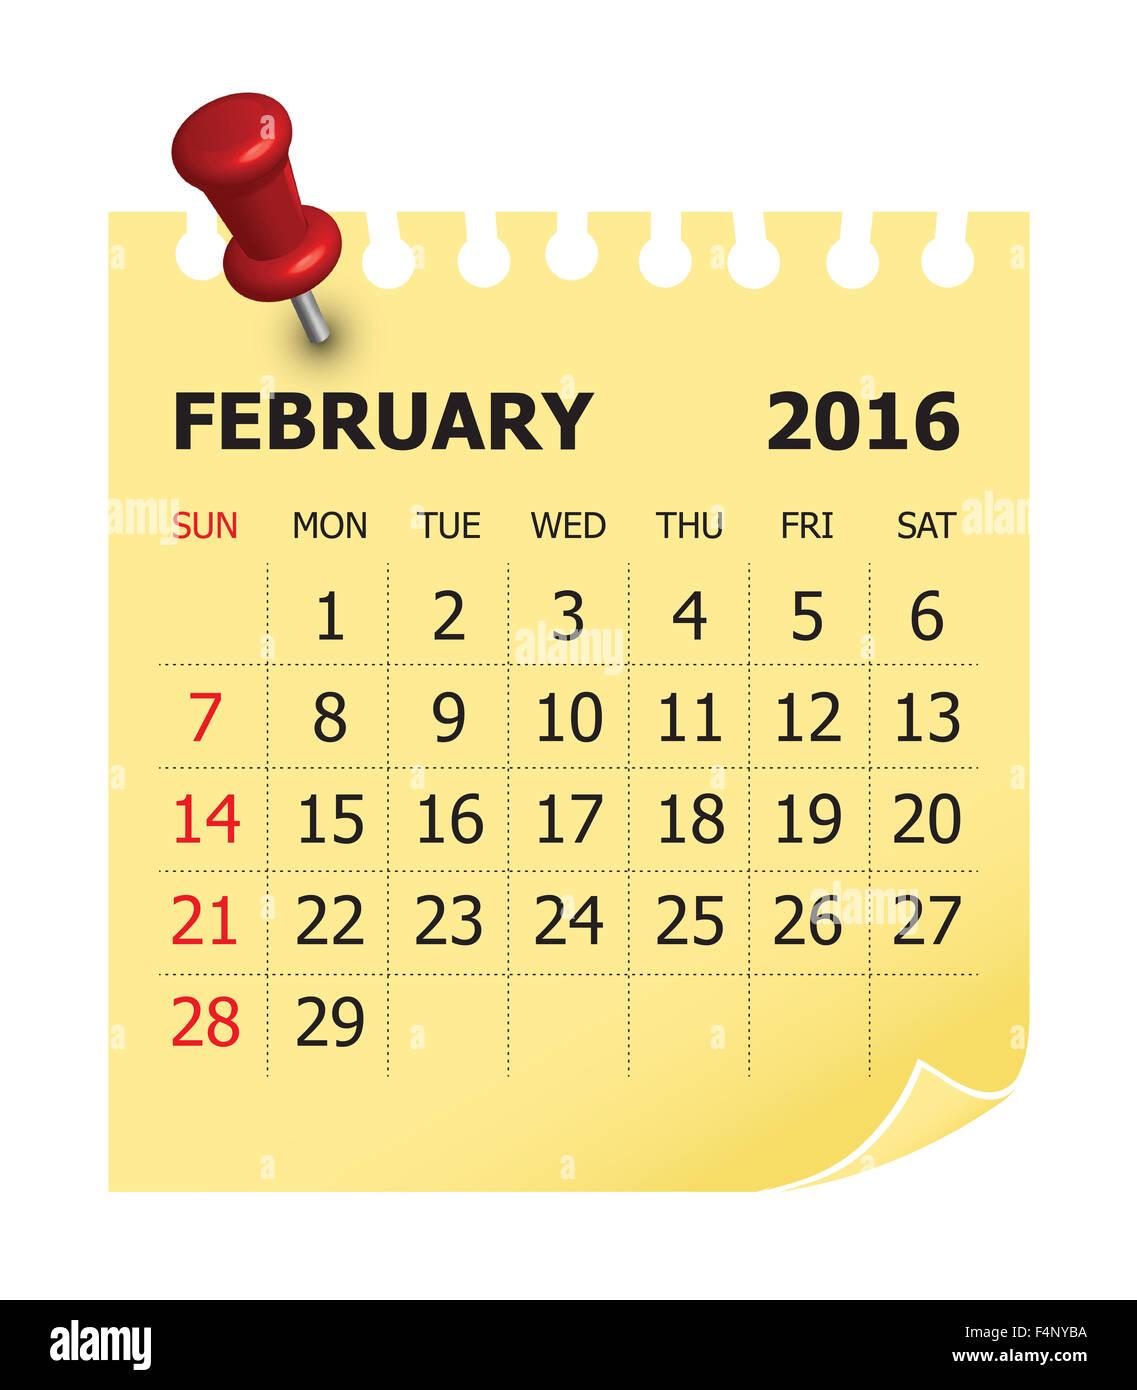 Simple calendar for February 2016 - Stock Image